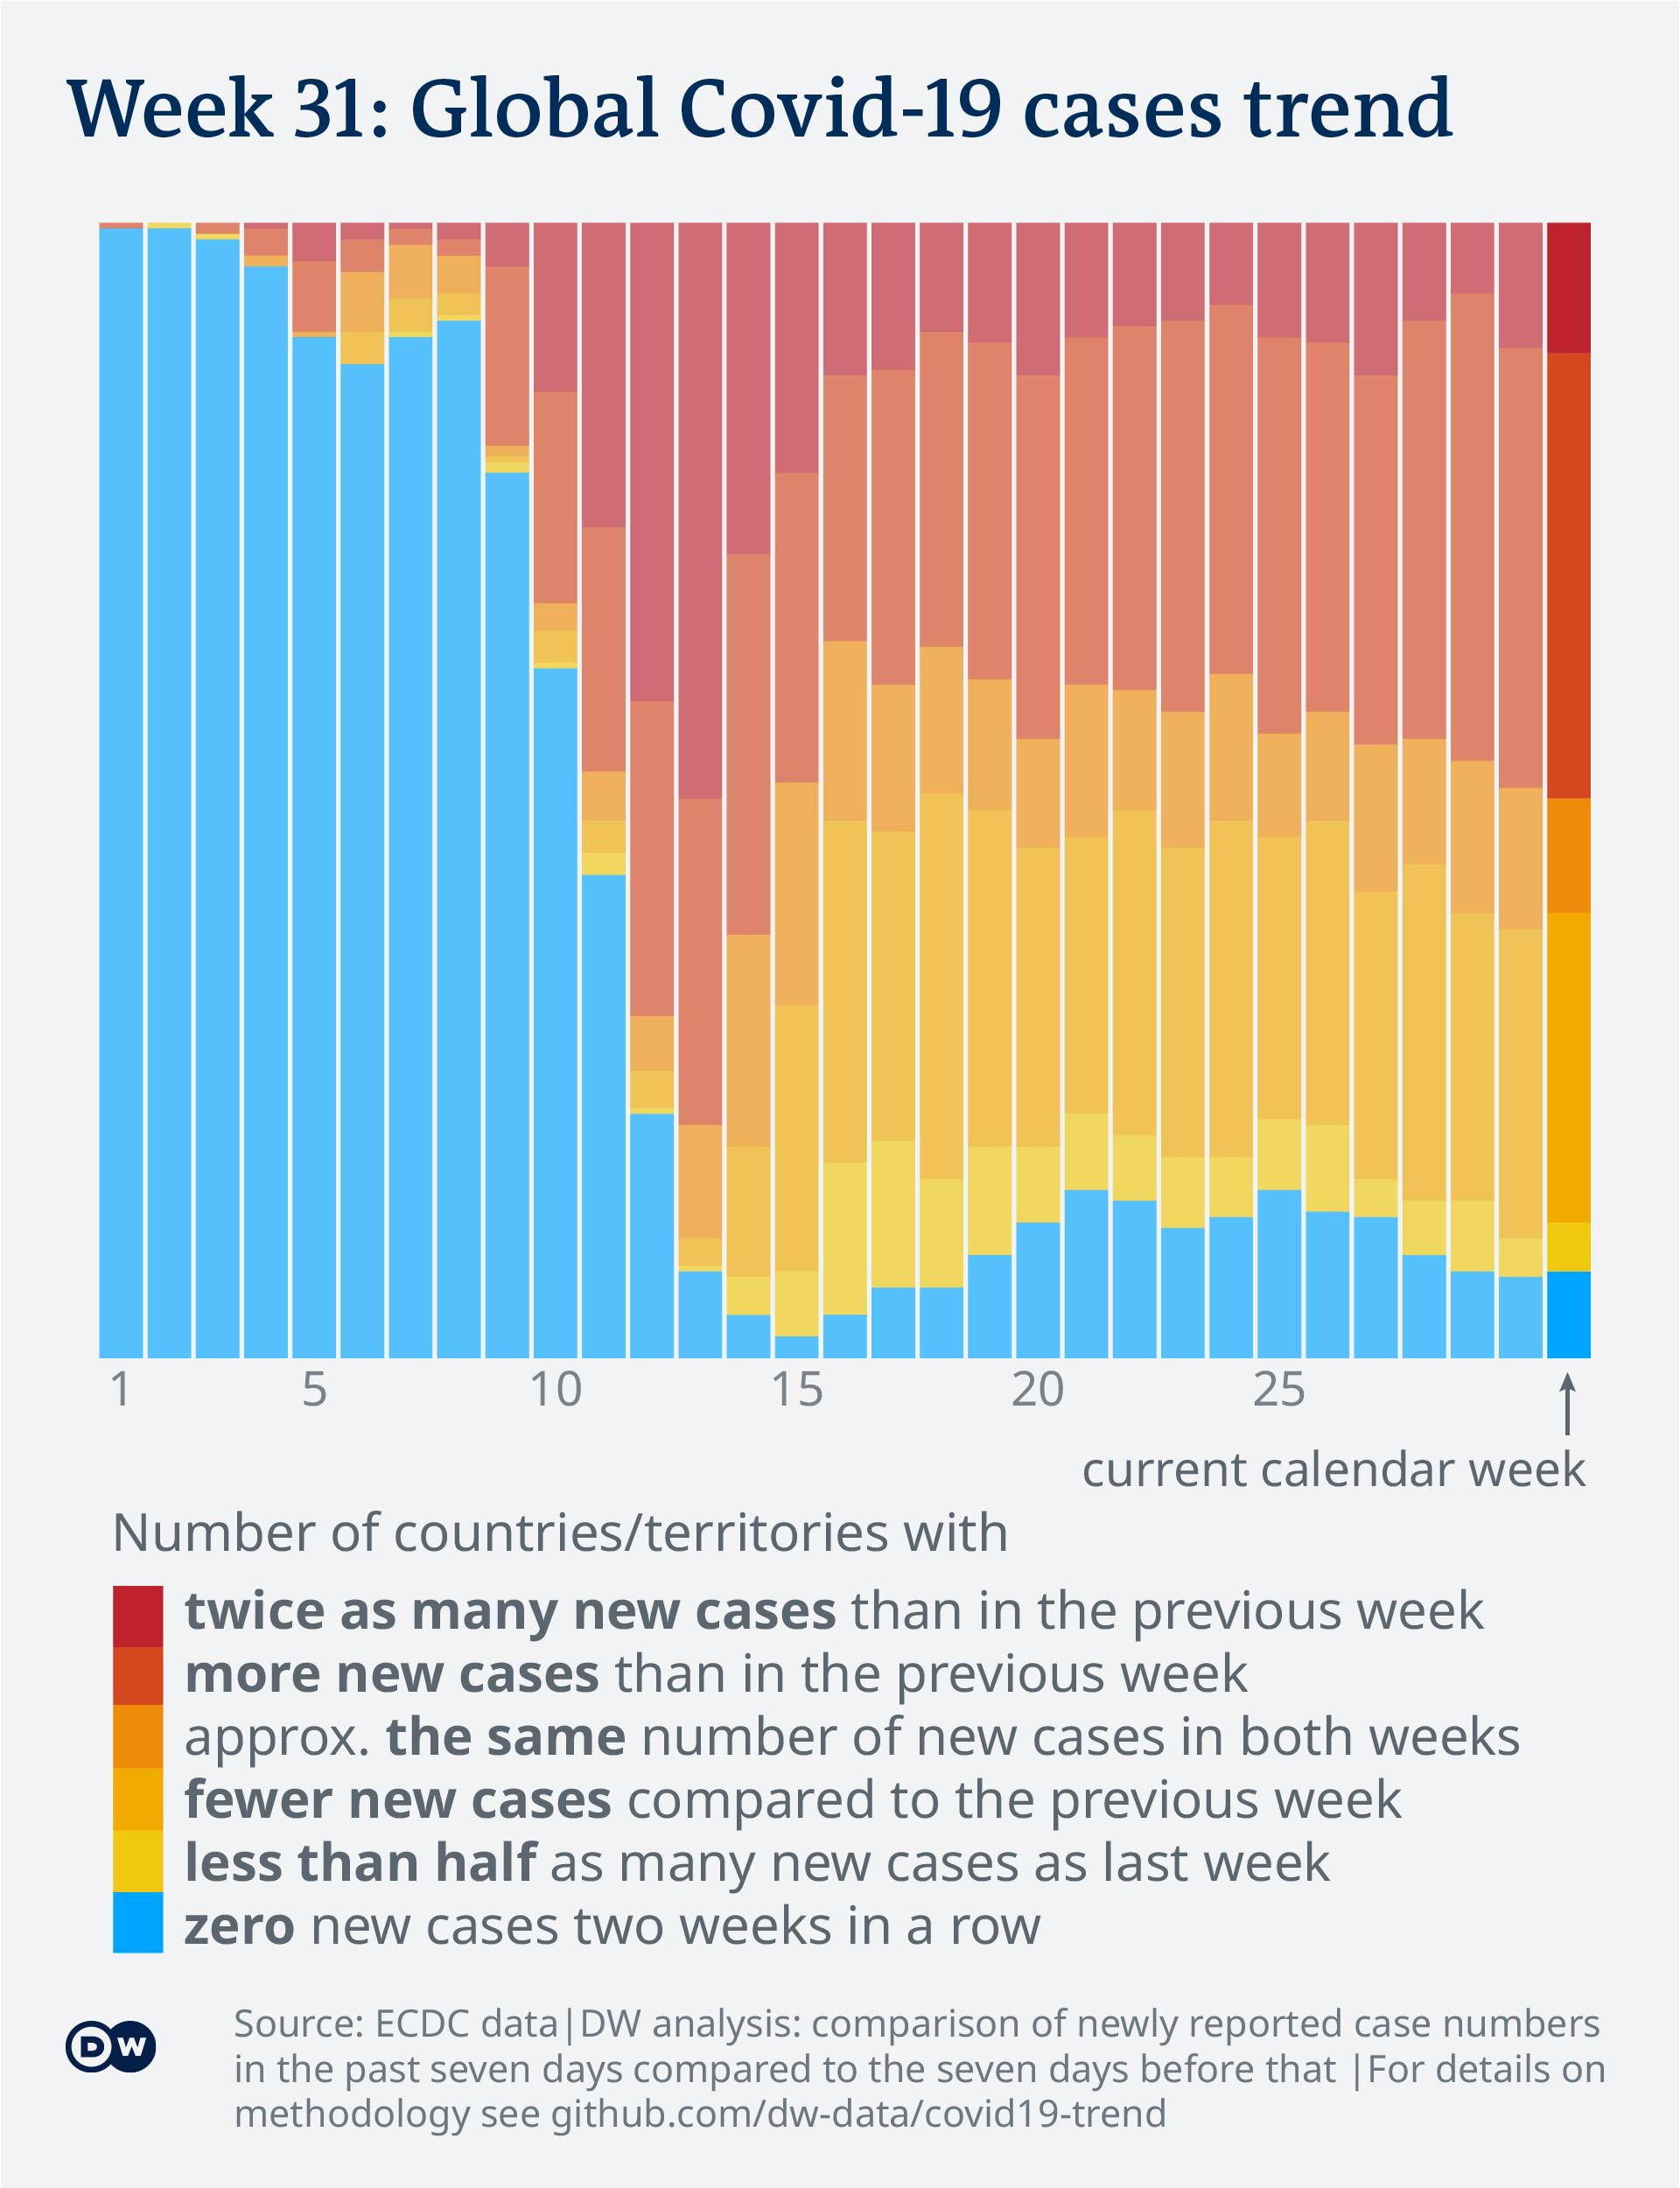 Data visualization: Covid-19 global new case numbers trend - all weeks until calendar week 31